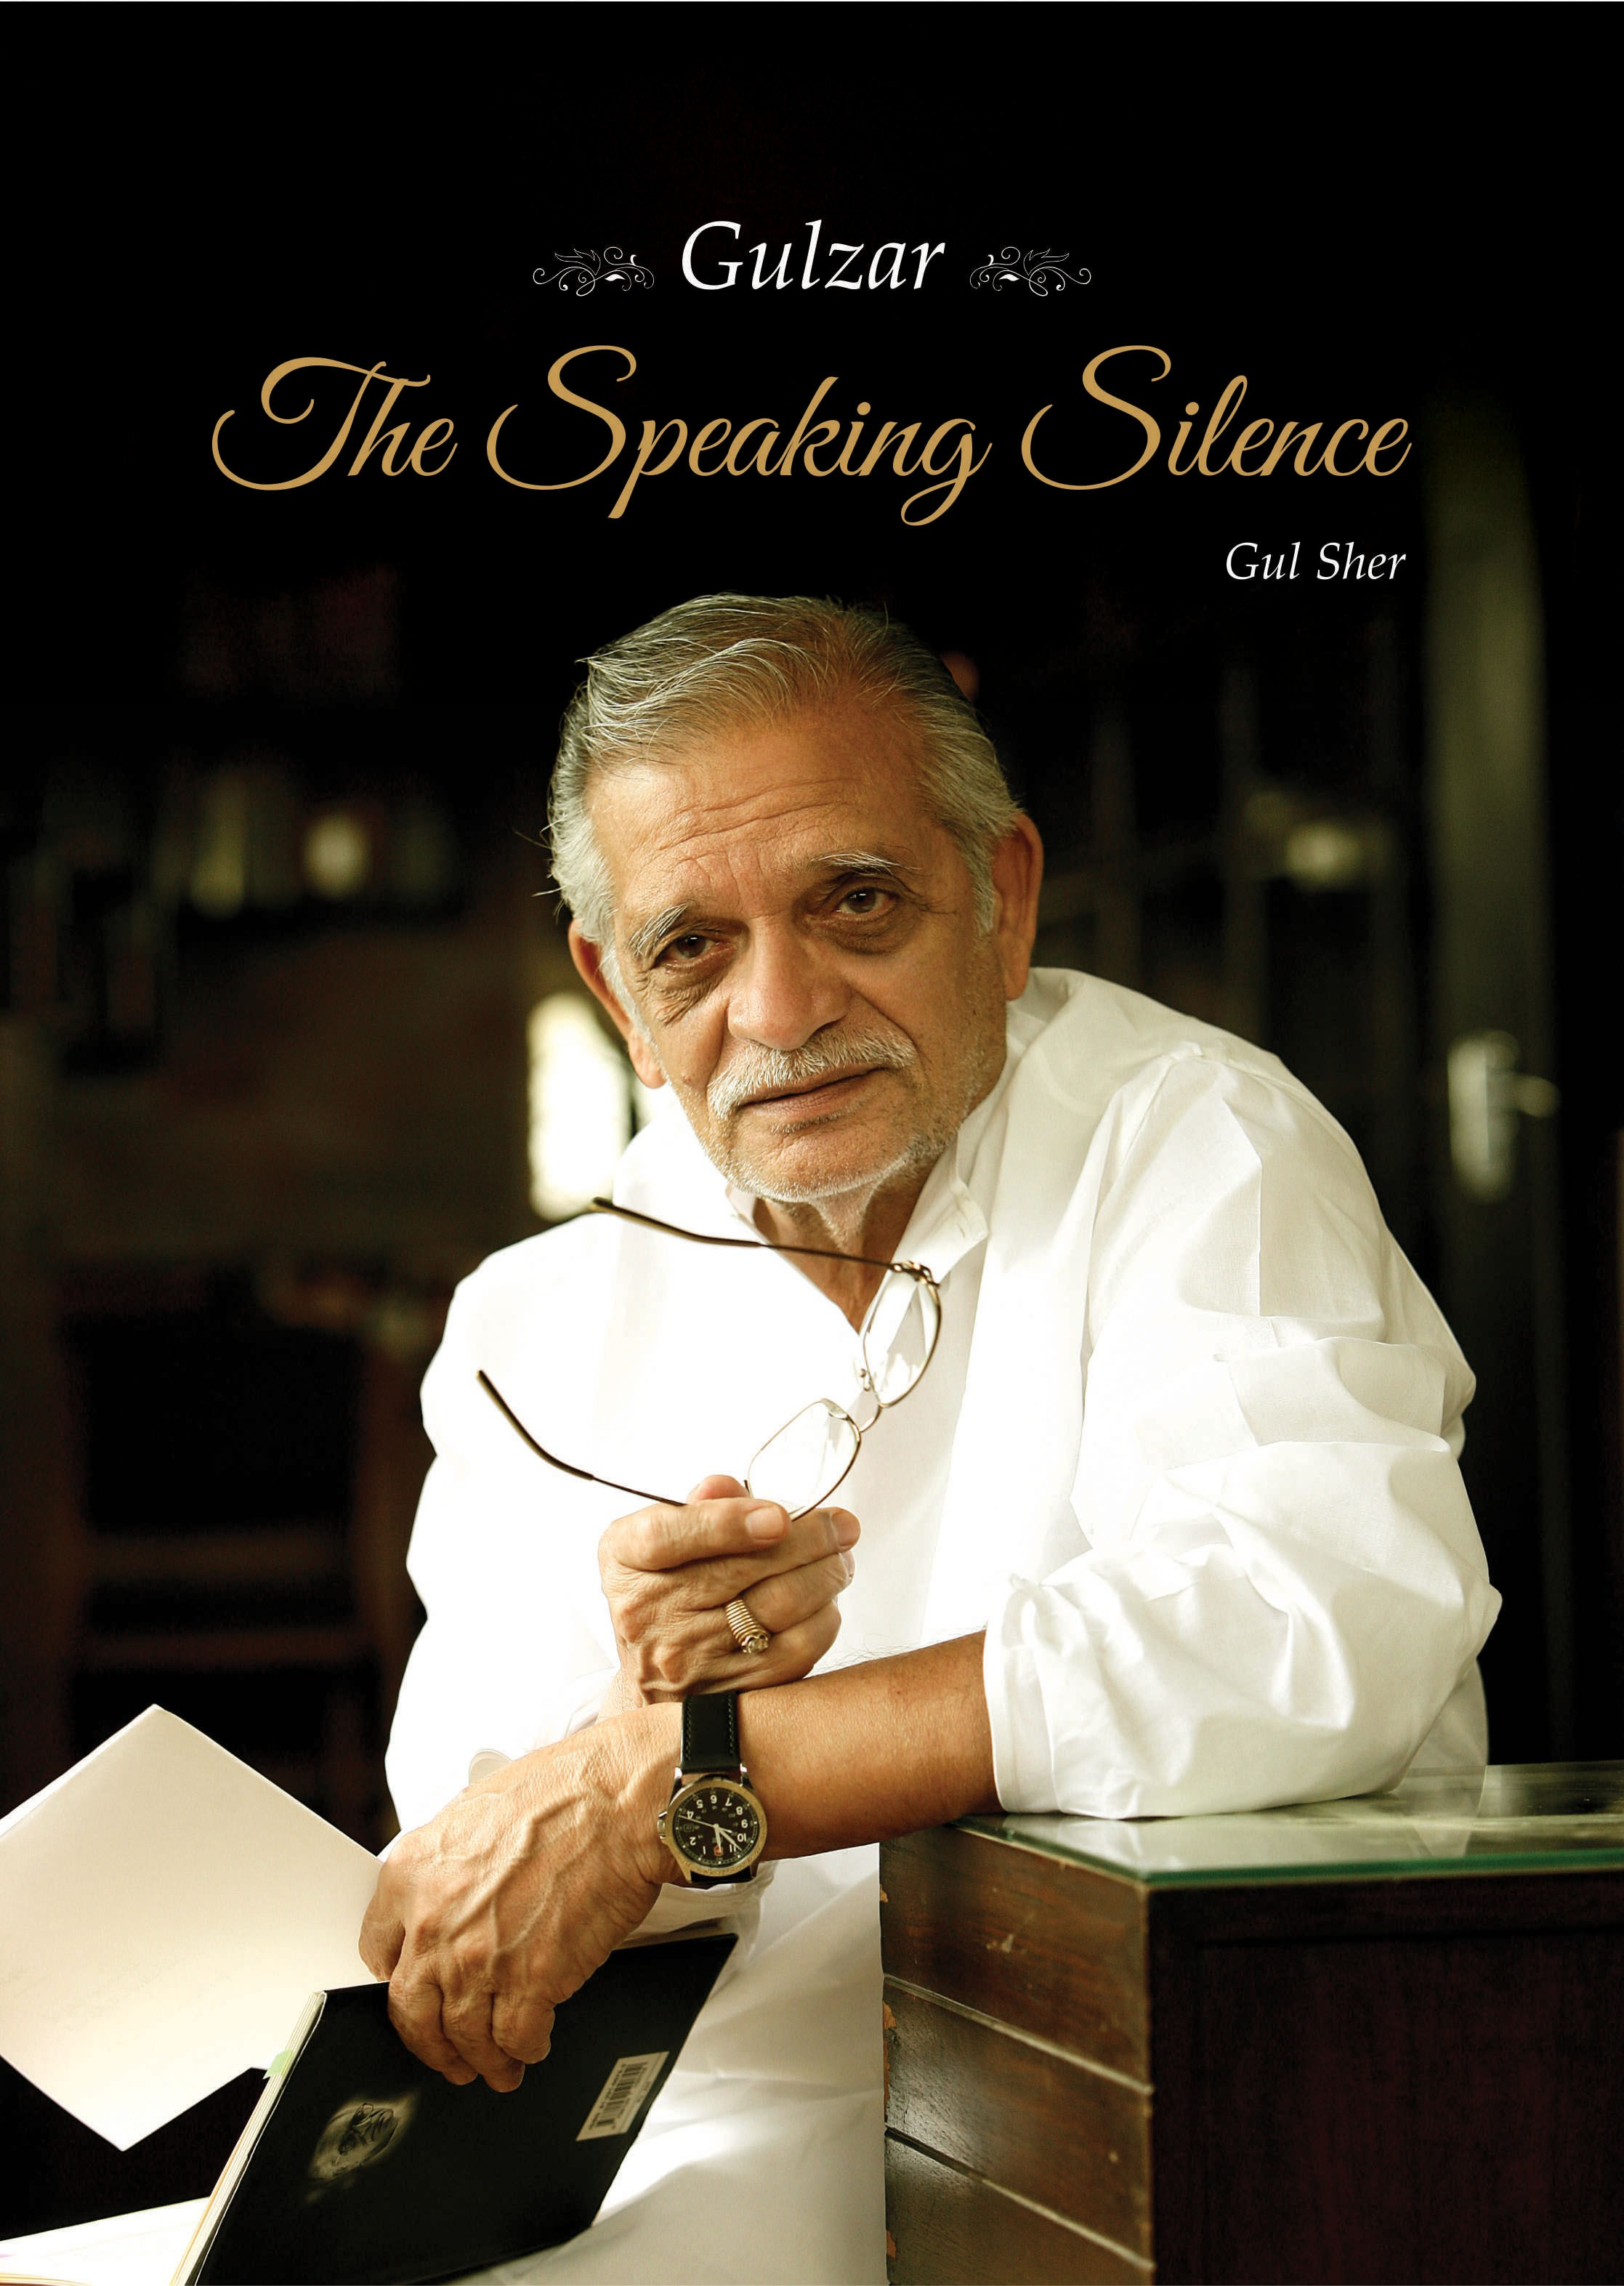 GULZAR - THE SPEAKING SILENCE